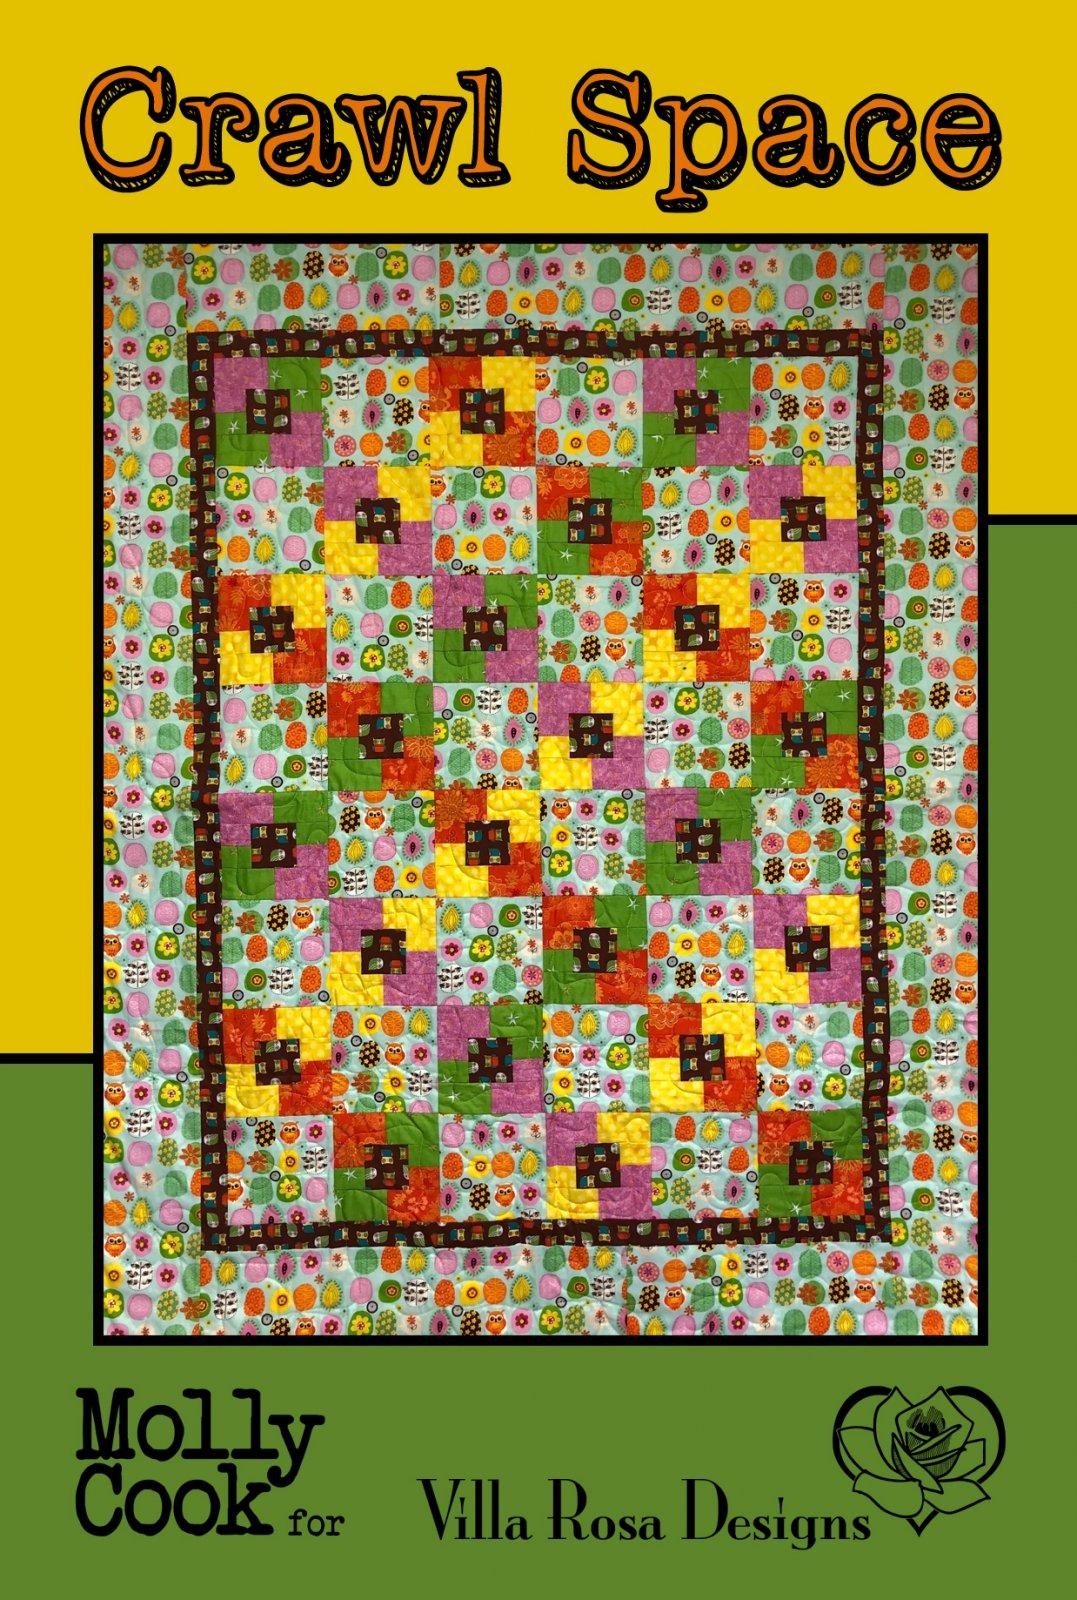 CRAWL SPACE - Villa Rosa - 36x48 (48x60with borders) - Theme